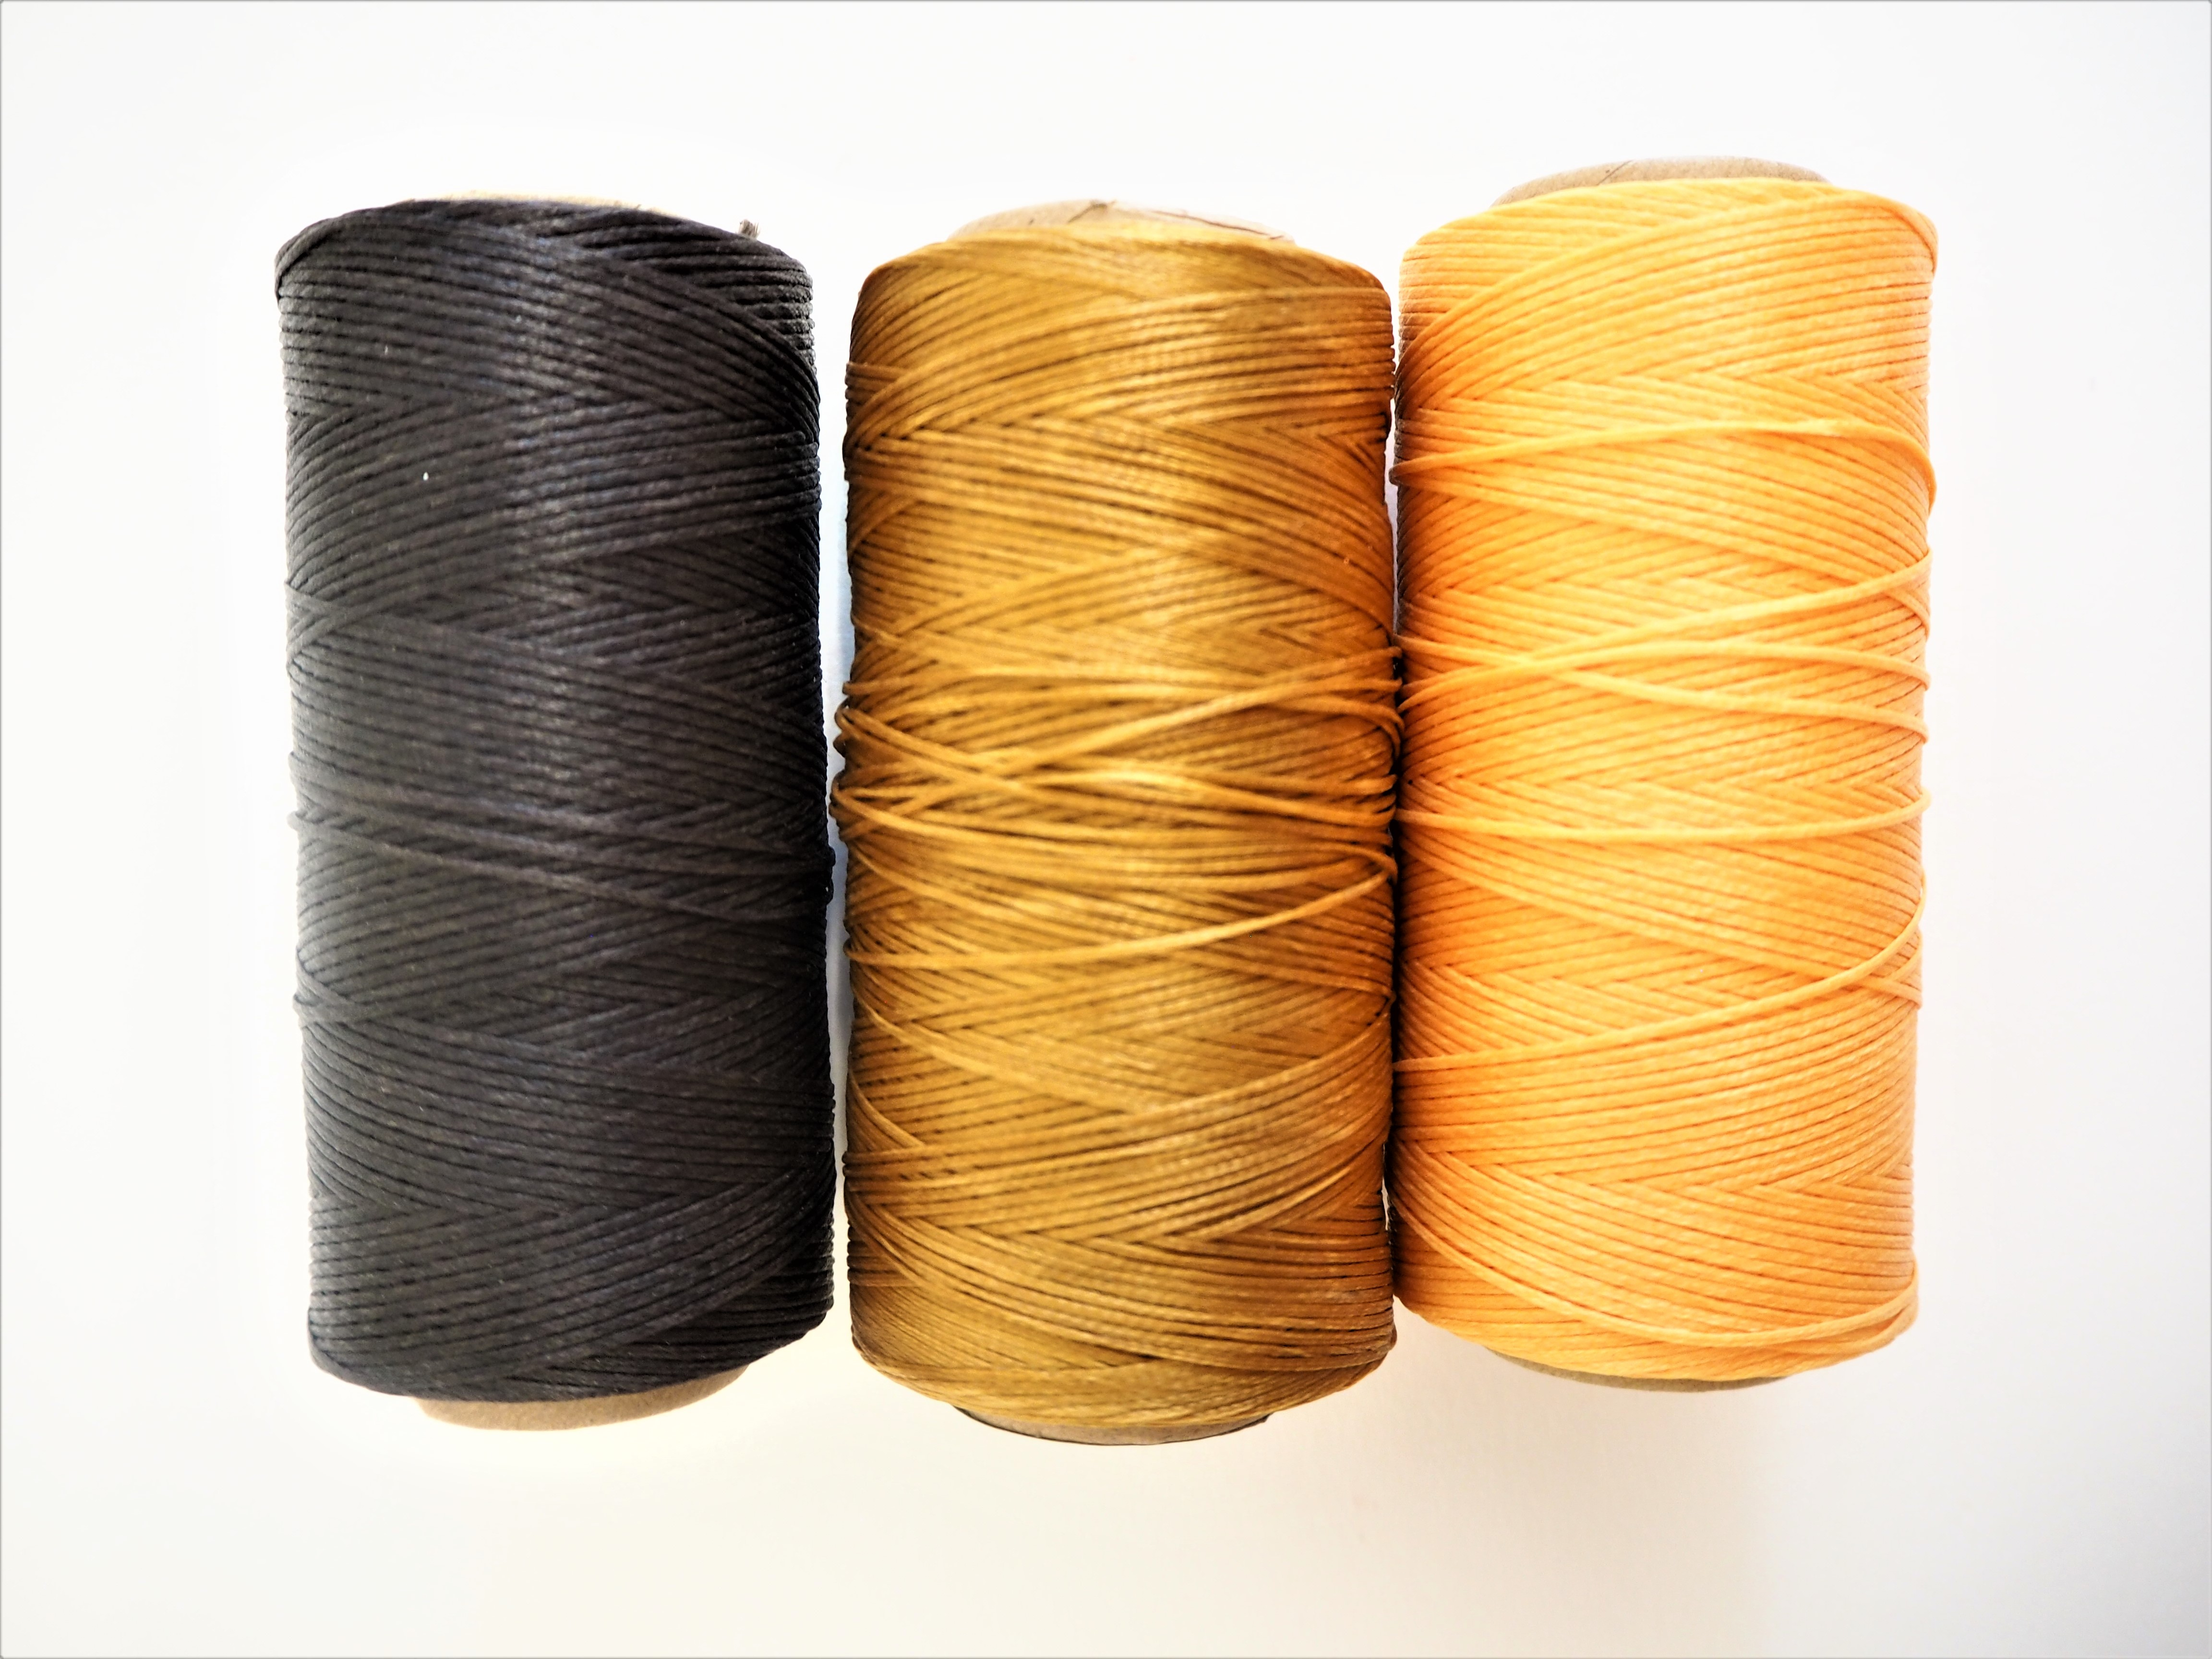 Waxed Bookbinding Thread - Dark Brown, Bronze and Yolk Yellow